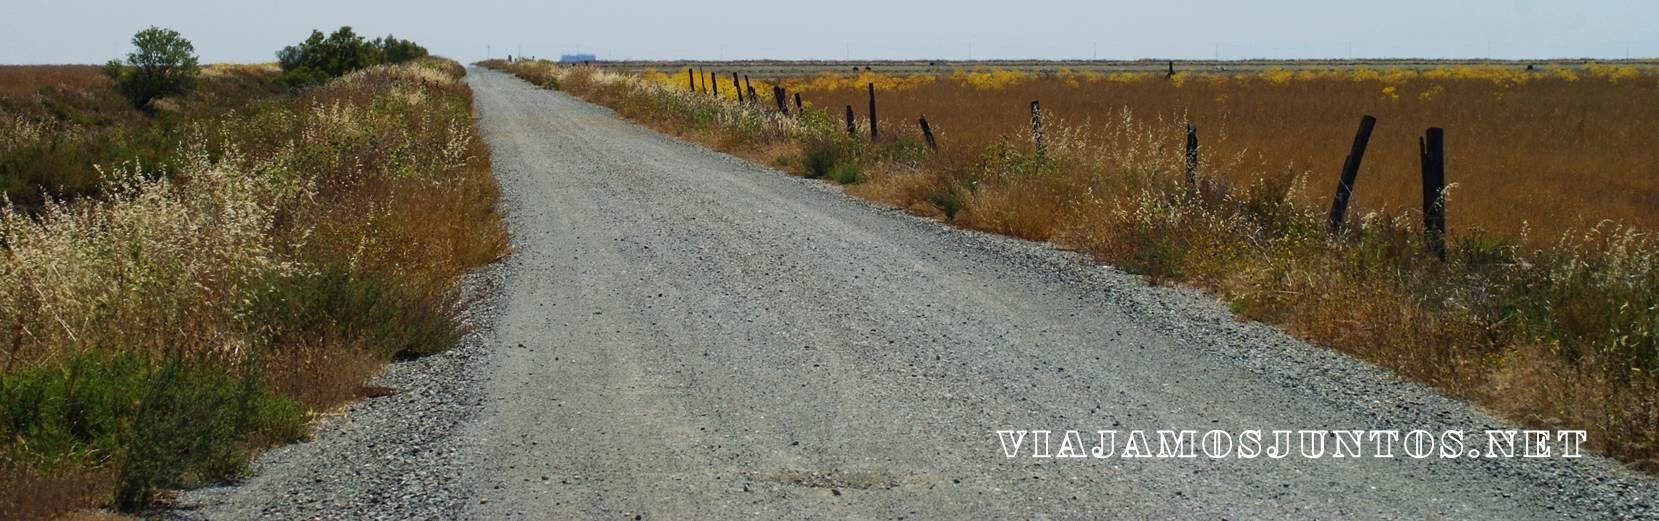 Doñana, rutas, senderismo, centros de interpretación, rocina el rocio, huelva, andalucia, acebuche, jose valverde